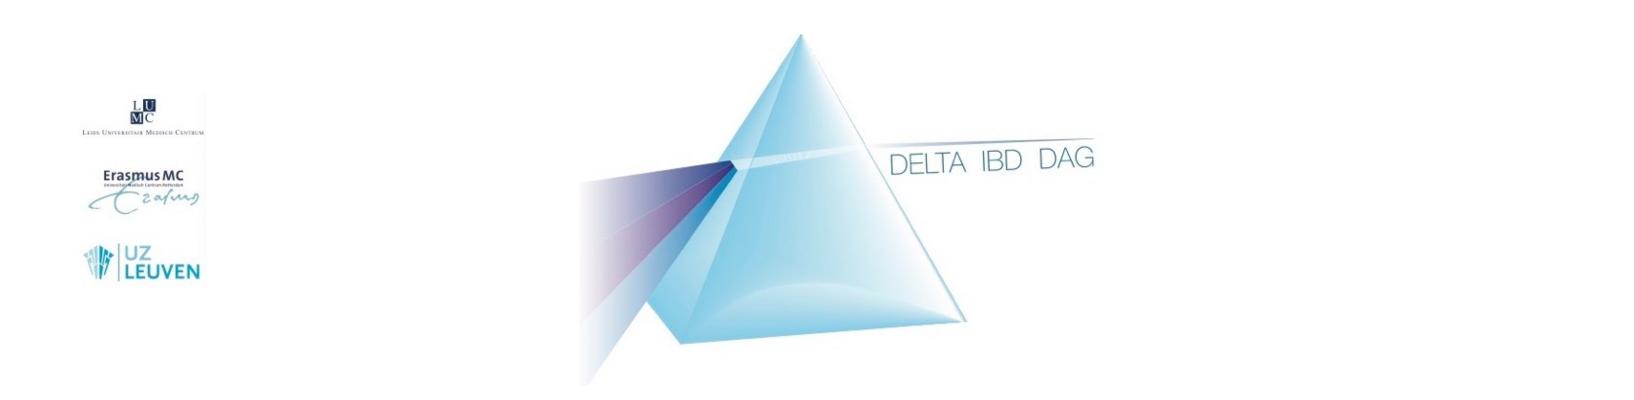 Delta IBD Dag